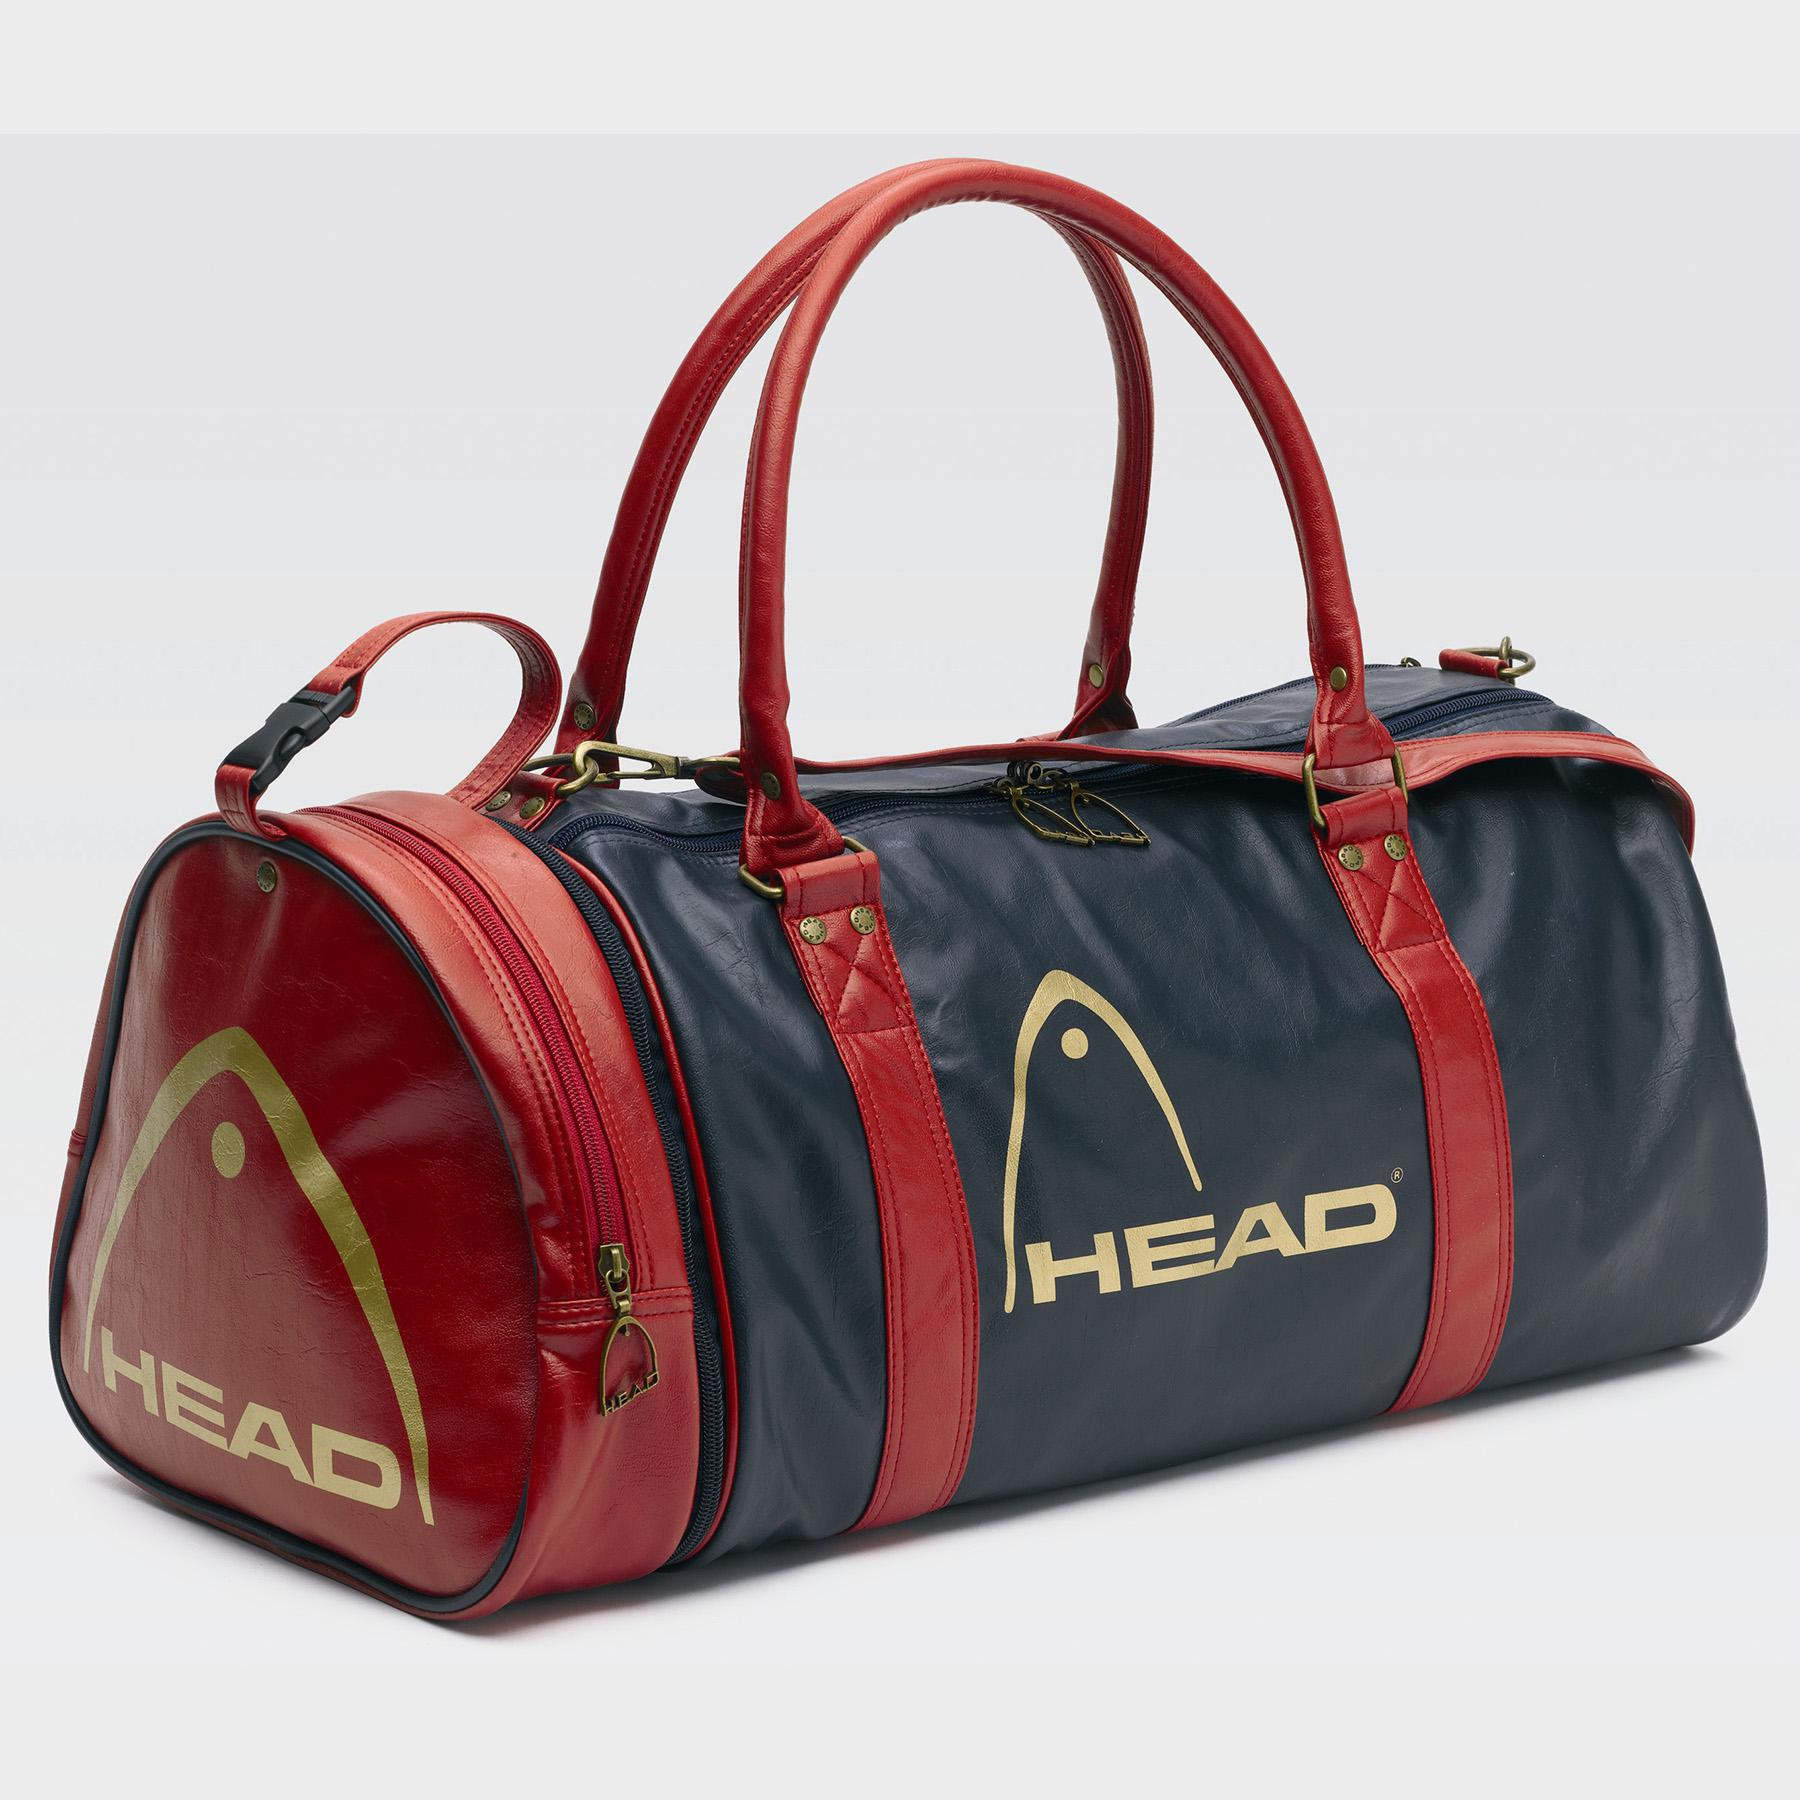 e586f5aa27 Head Retro Monte Carlo Holdall - Navy Red - Tennisnuts.com